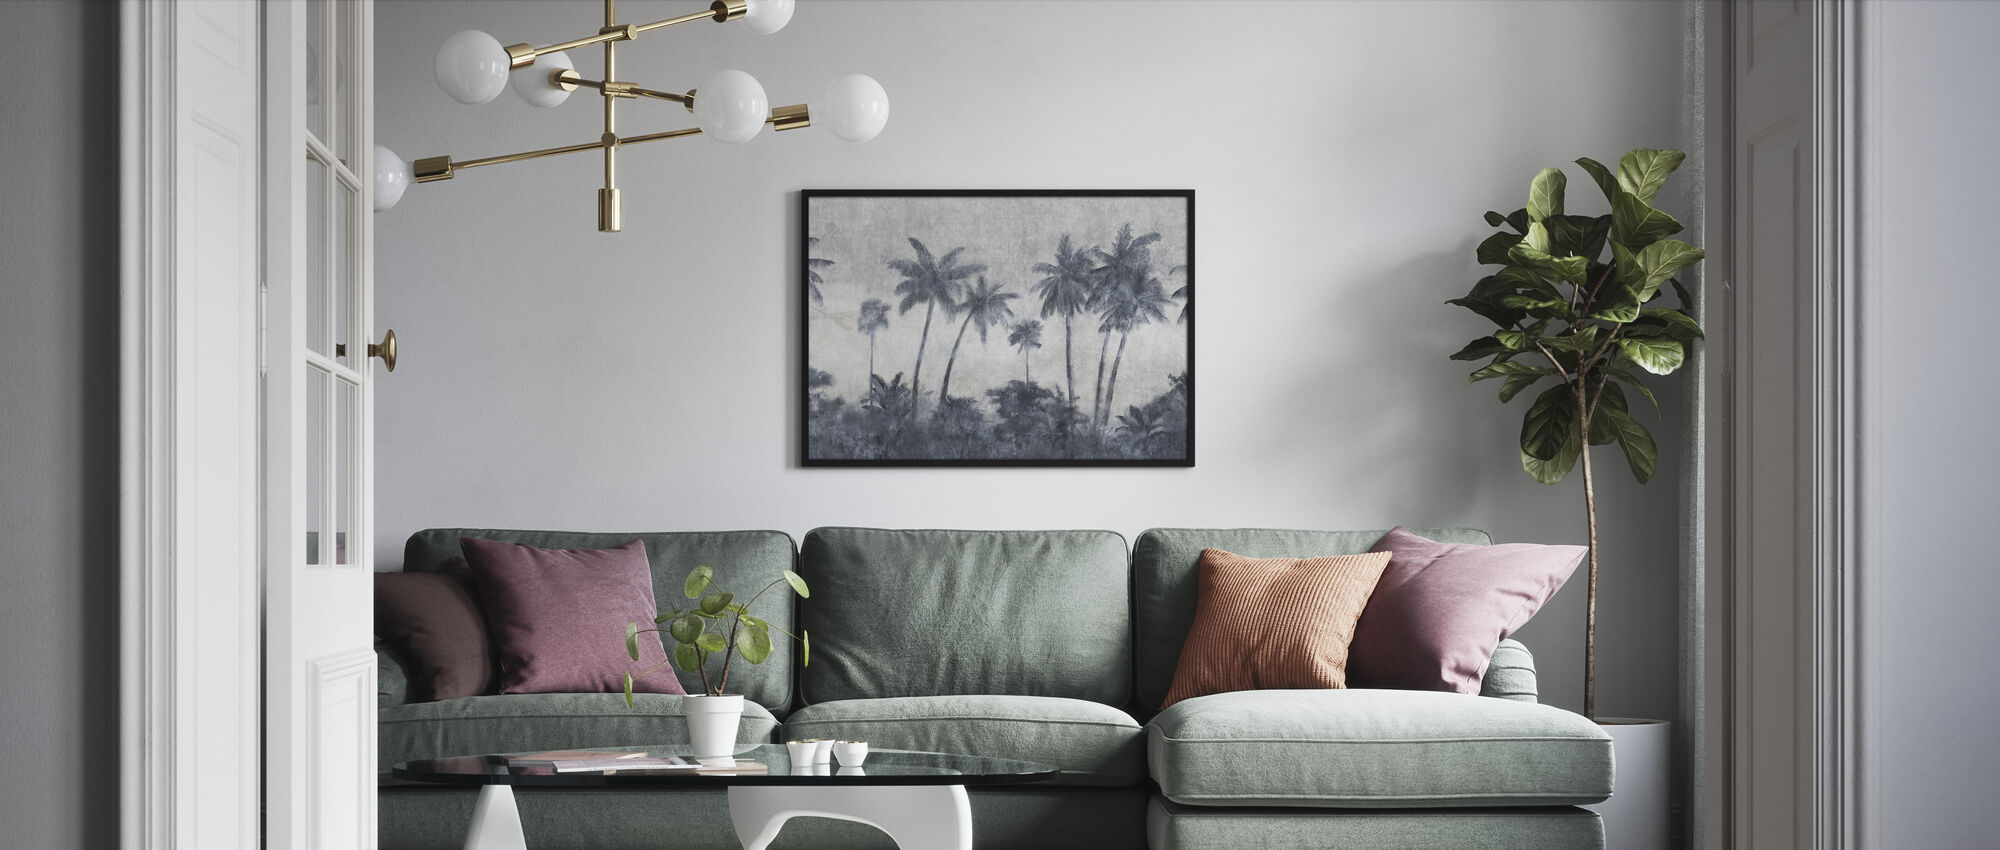 California Palmes on Concrete - Framed print - Living Room